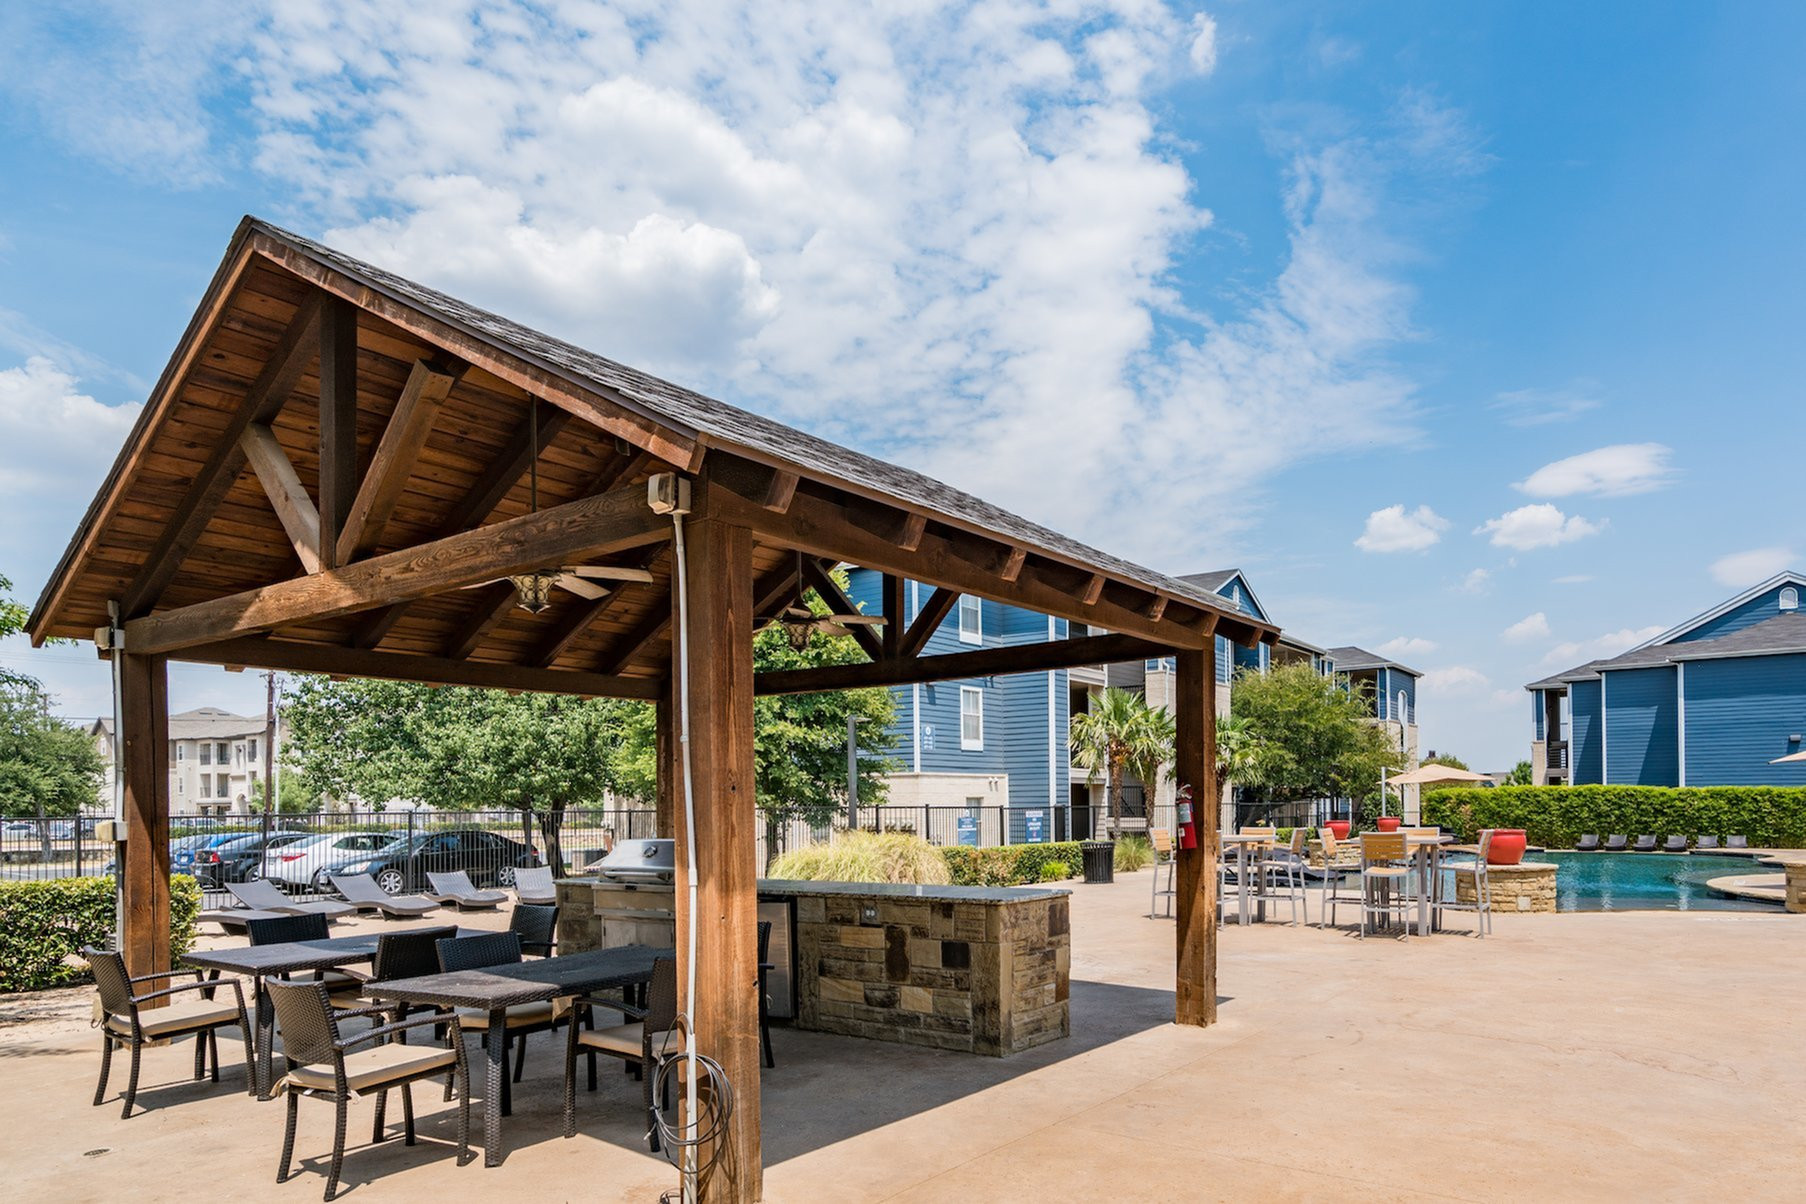 Community BBQ Grills | Denton TX Apartment For Rent | Castlerock at Denton